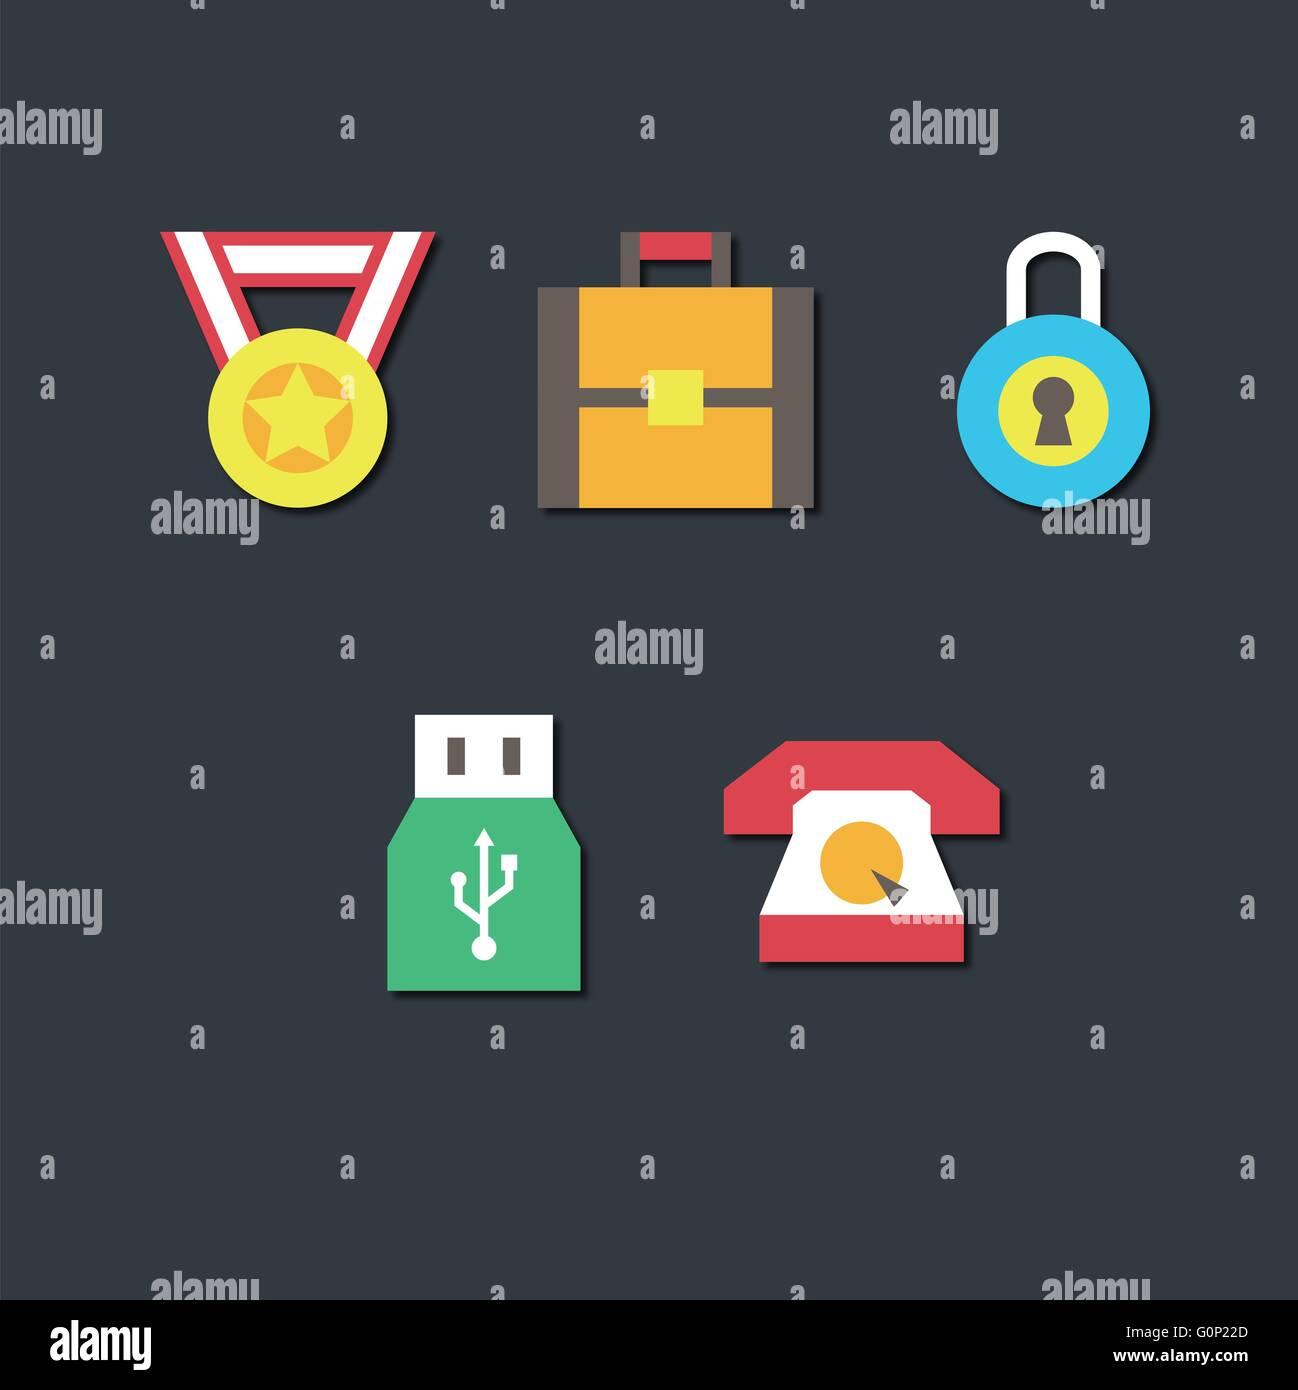 Simple Illust Icon - Stock Vector